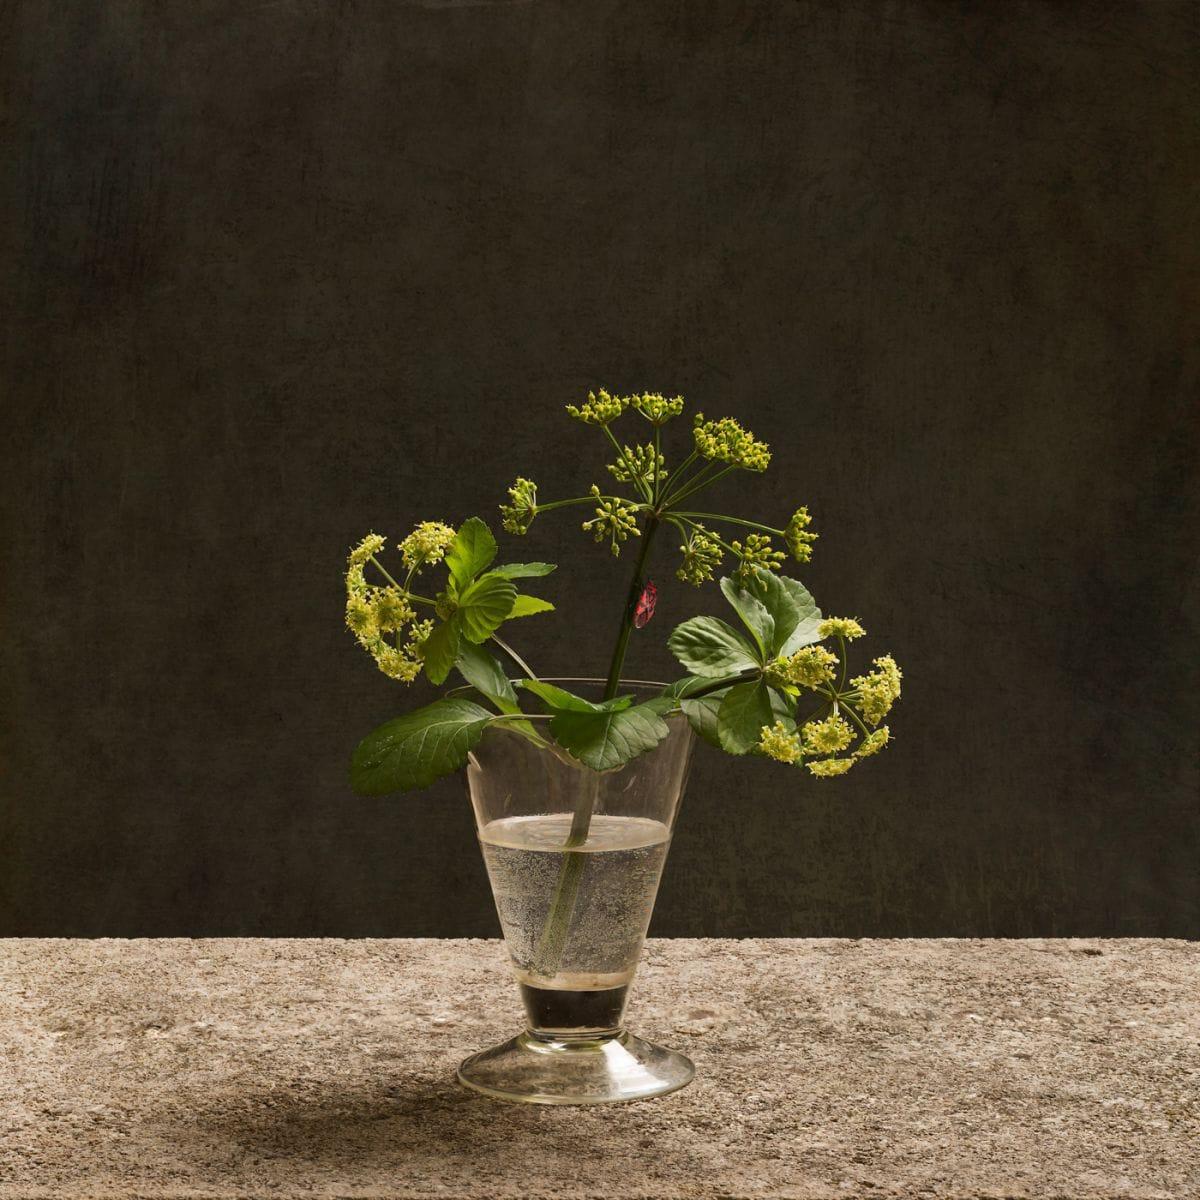 Kunst: Lavas van kunstenaar Tineke Stoffels